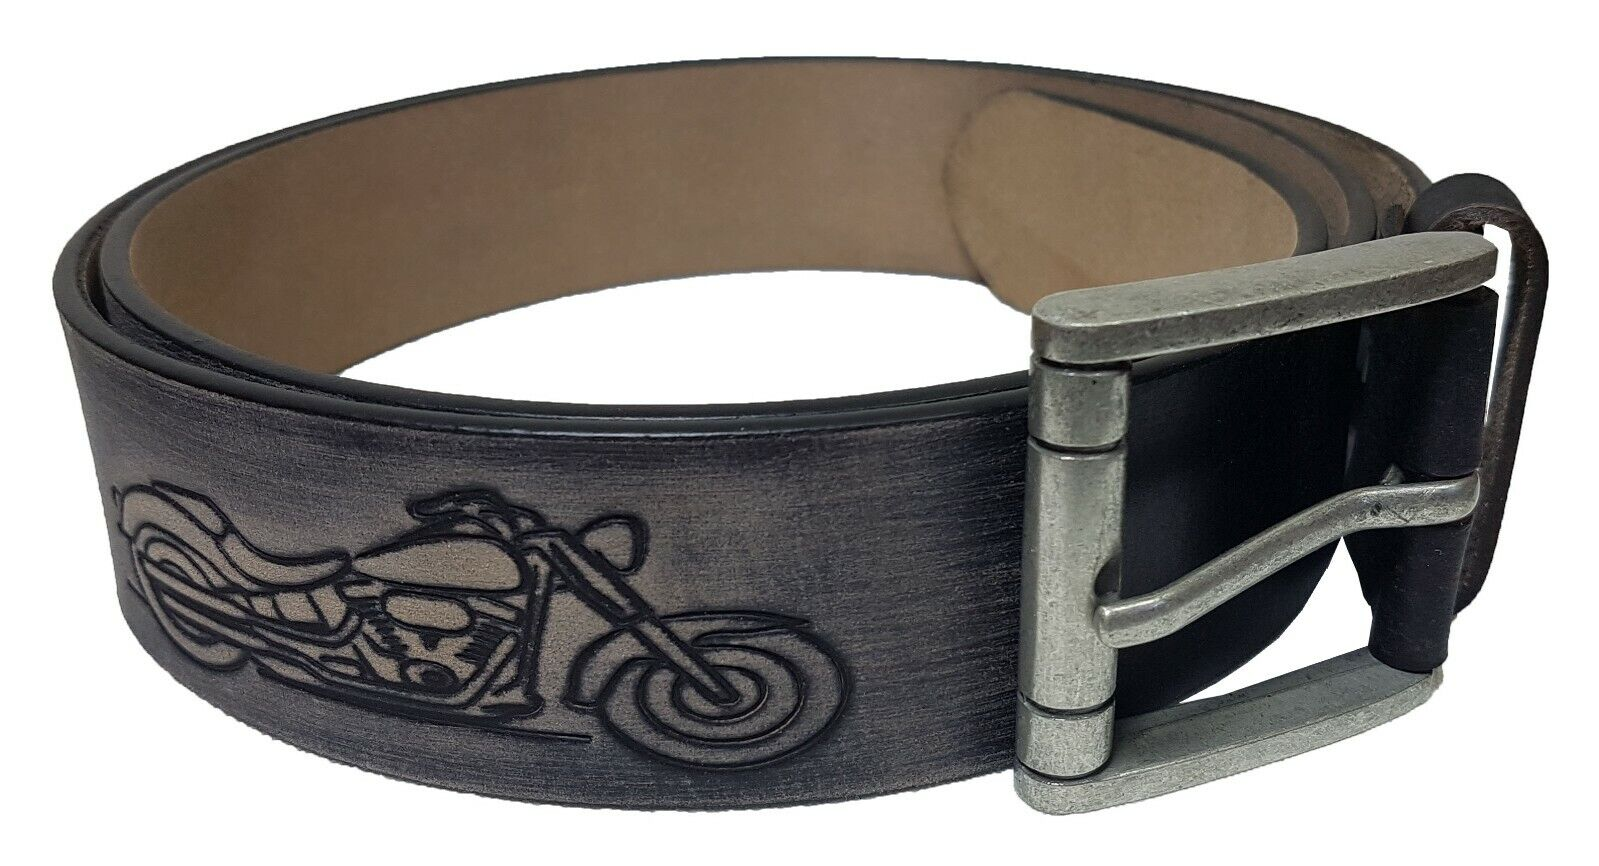 Echt Leder Gürtel Motorrad Harley Schwarz 4,5 cm Breit - Biker